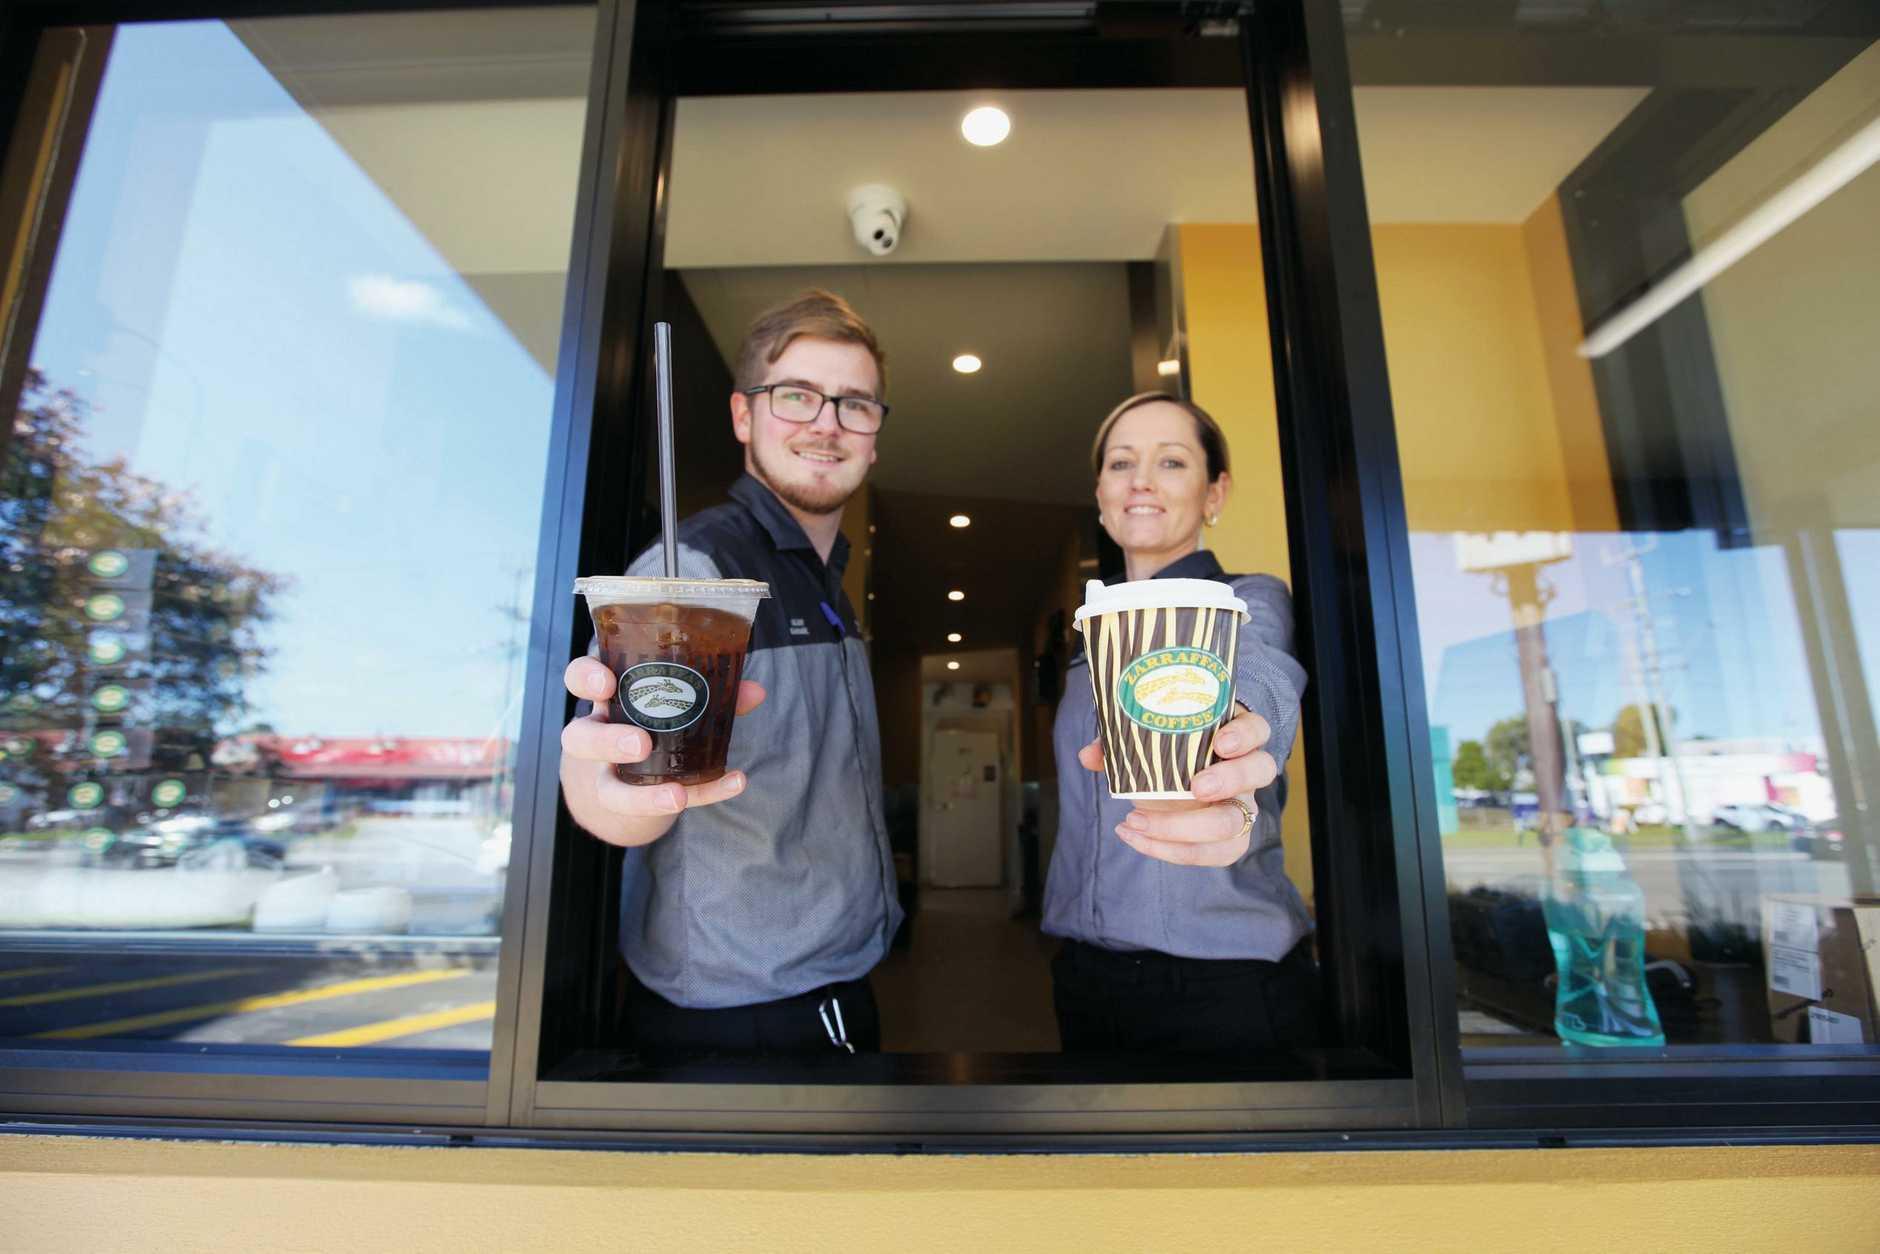 Zarraffa's Coffee South Tweed team members Glenn Wornes and Shandice Densley.